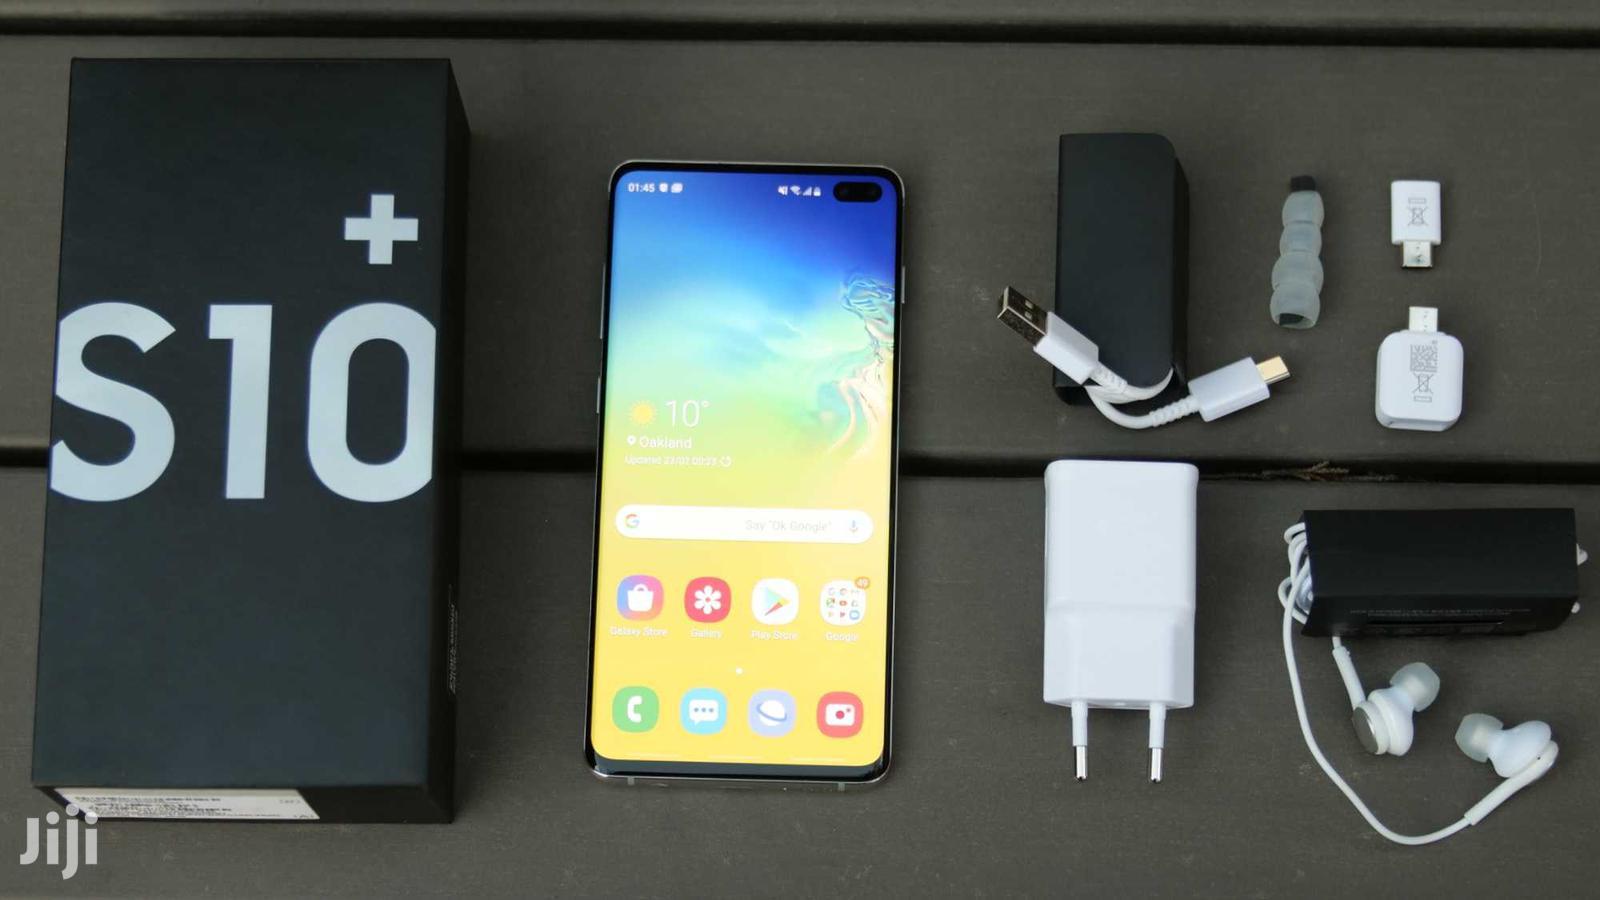 New Samsung Galaxy S10 Plus 128 GB | Mobile Phones for sale in Nairobi Central, Nairobi, Kenya